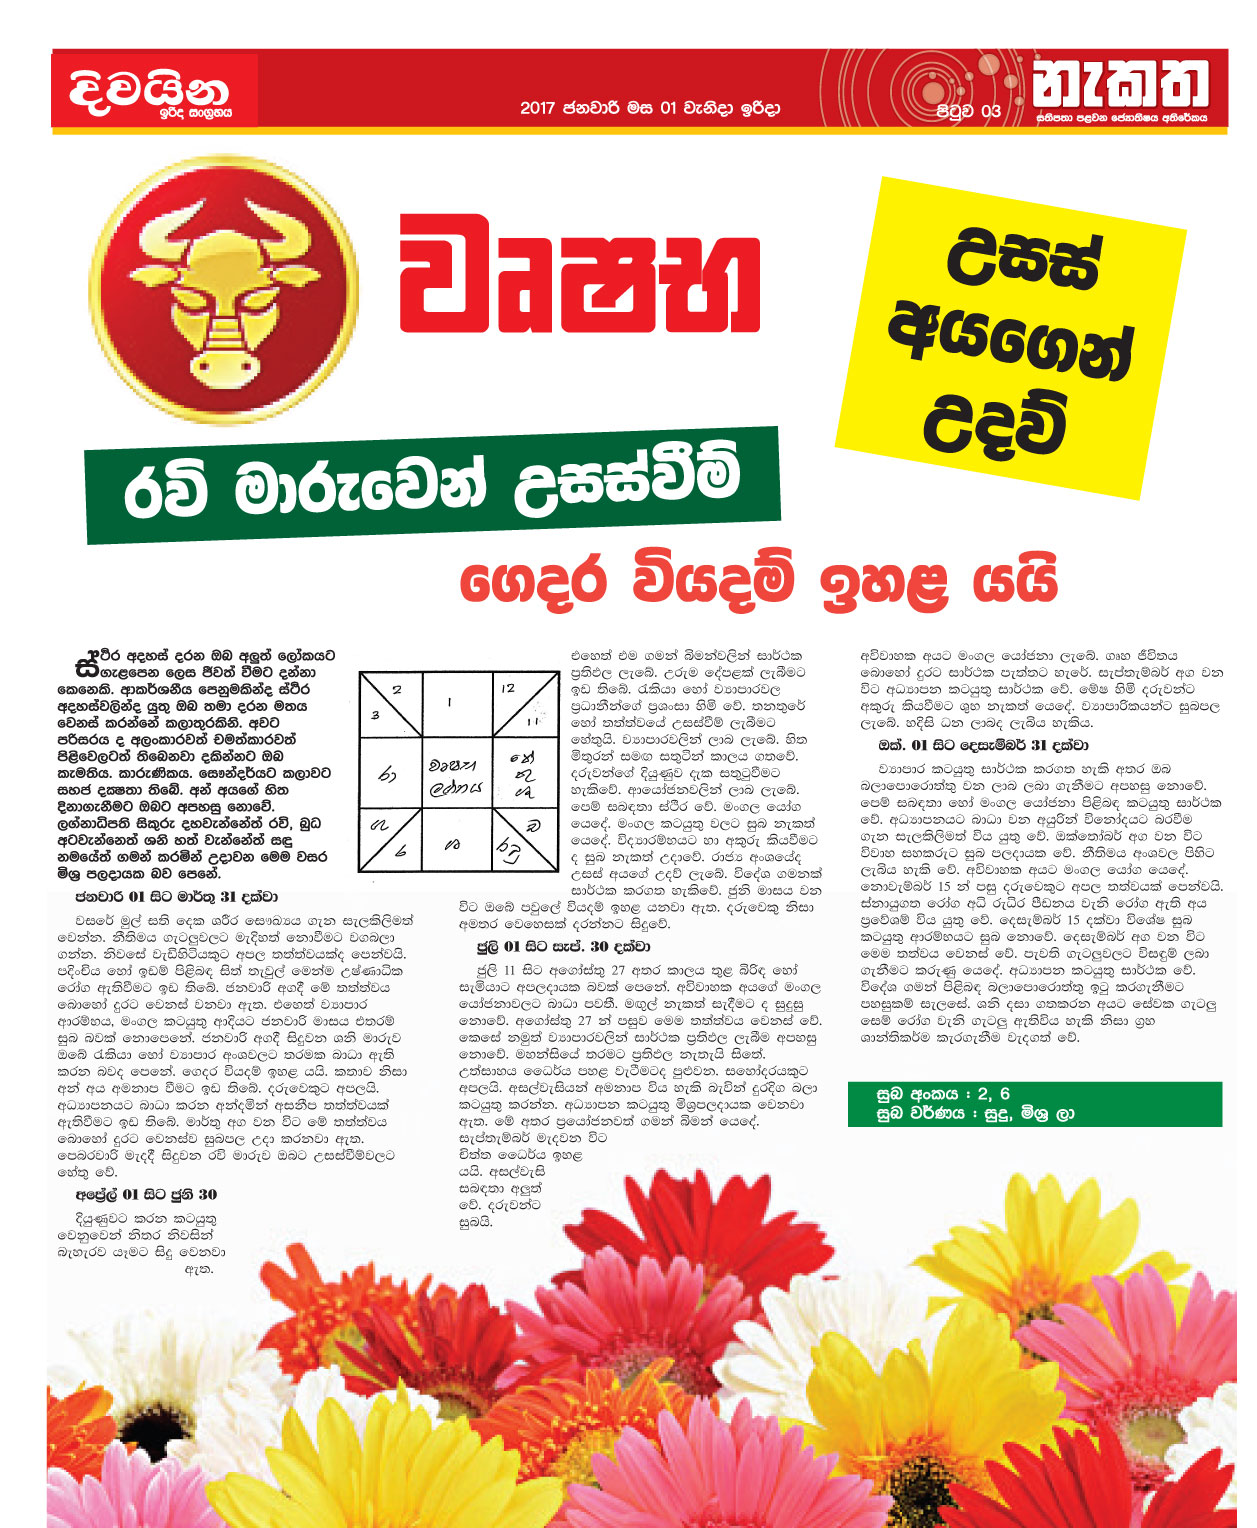 Divaina Newspaper Lagna Palapala